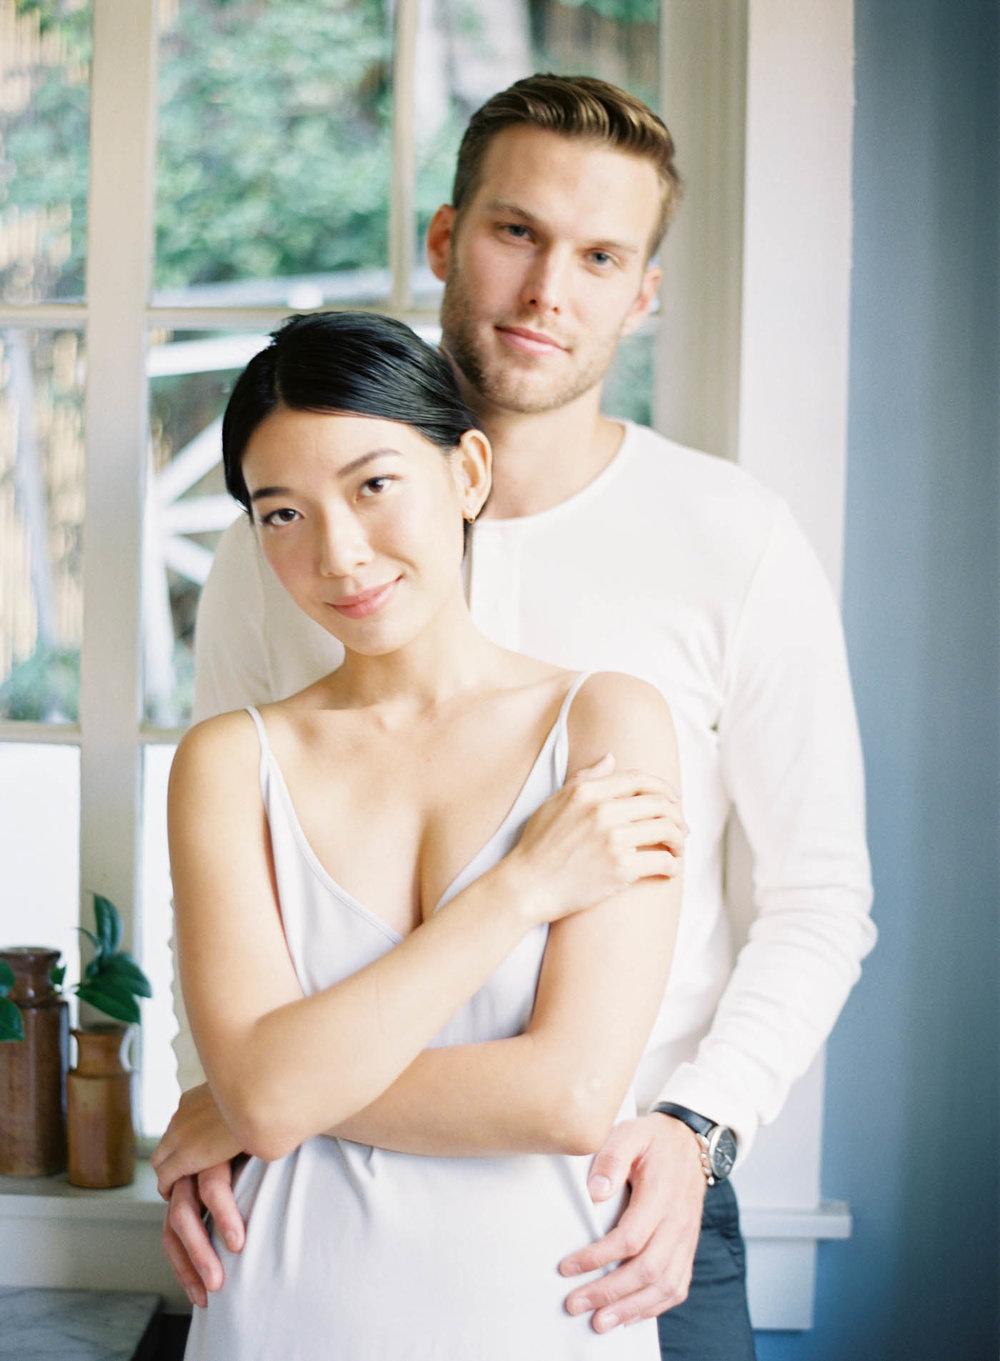 riviera-house-engagement-120-Jen_Huang-Tea-Ceremony-364-Jen_Huang-004147-R1-007.jpg